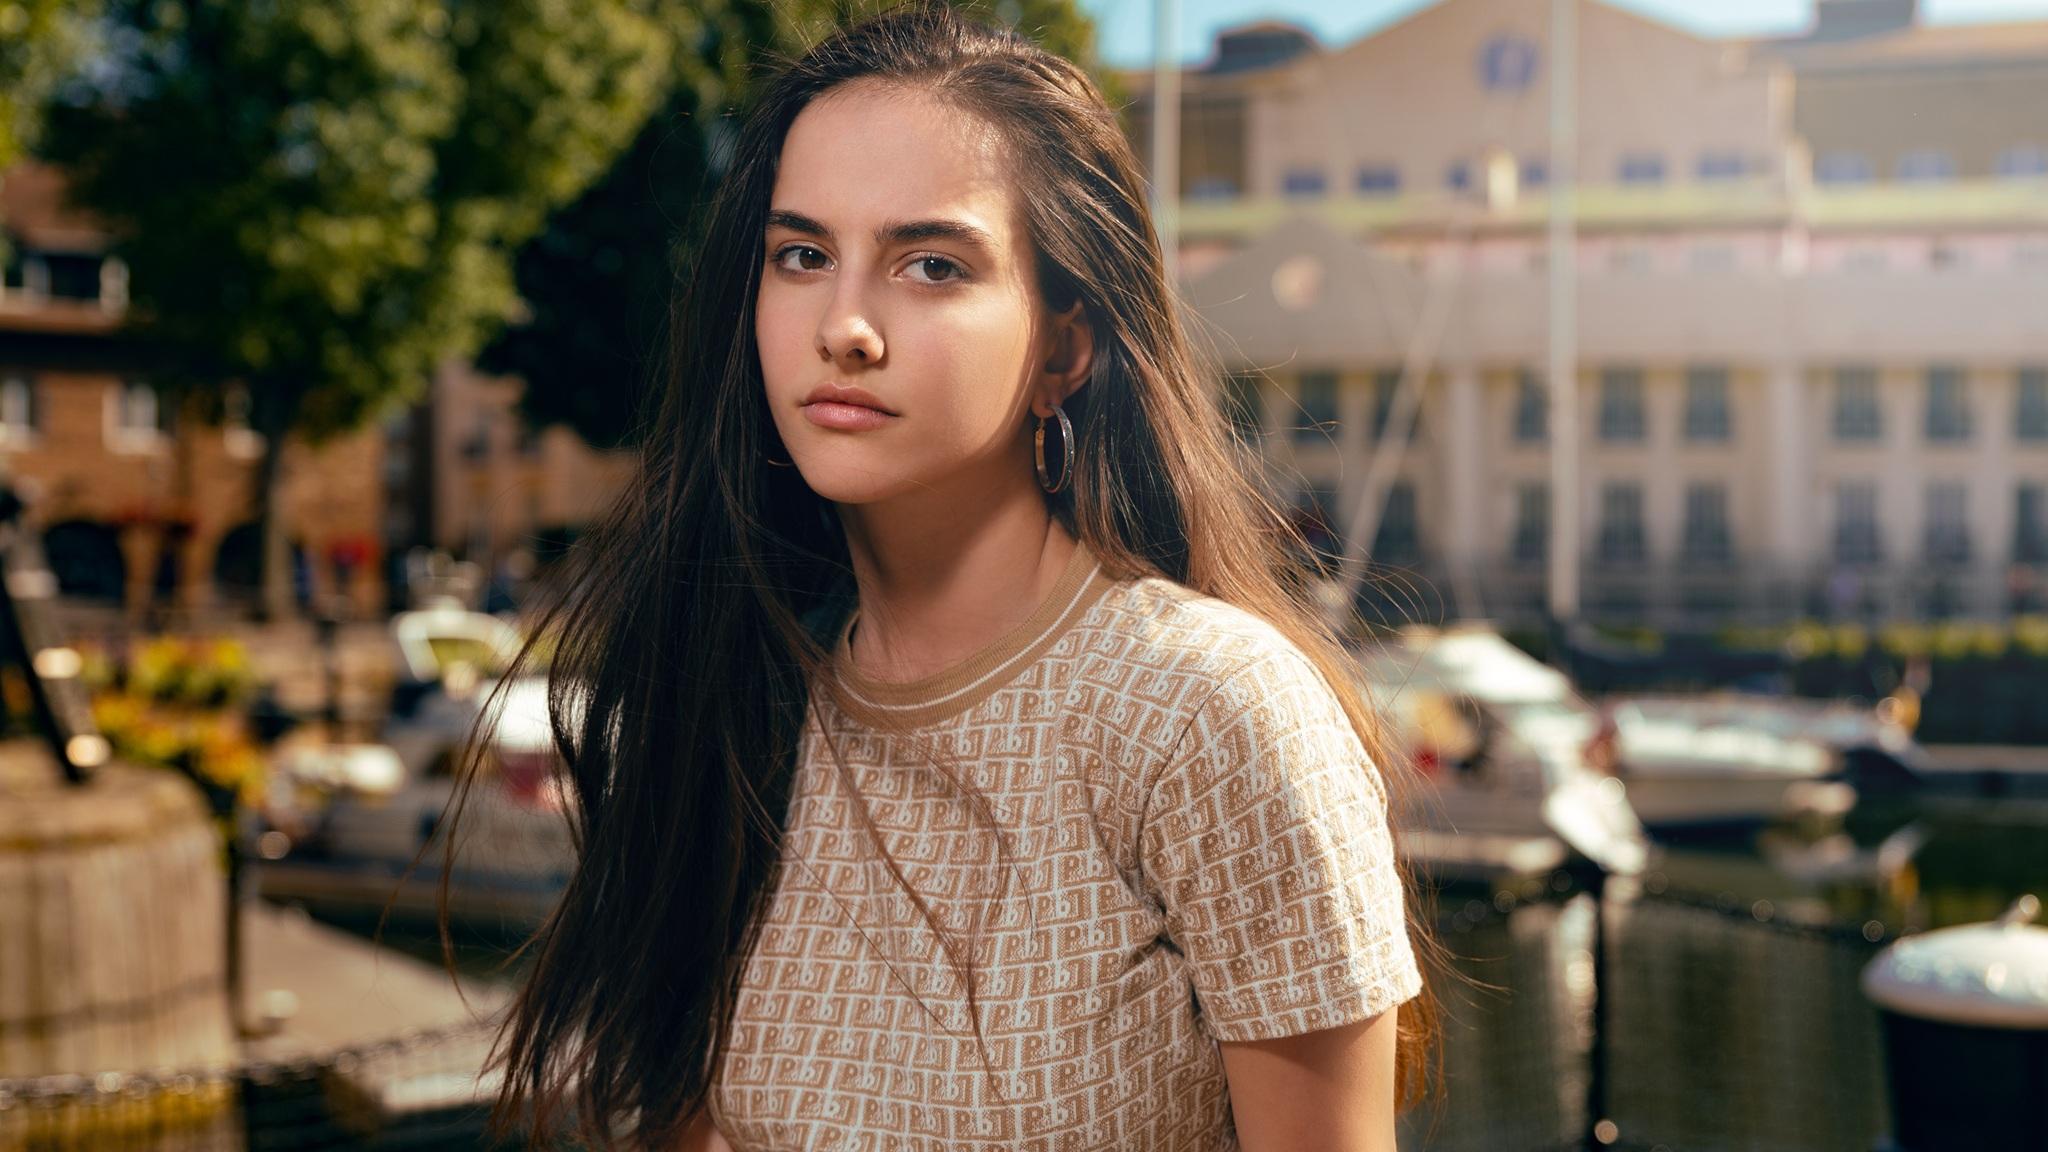 brown-hair-girl-glanced-4k-cm.jpg